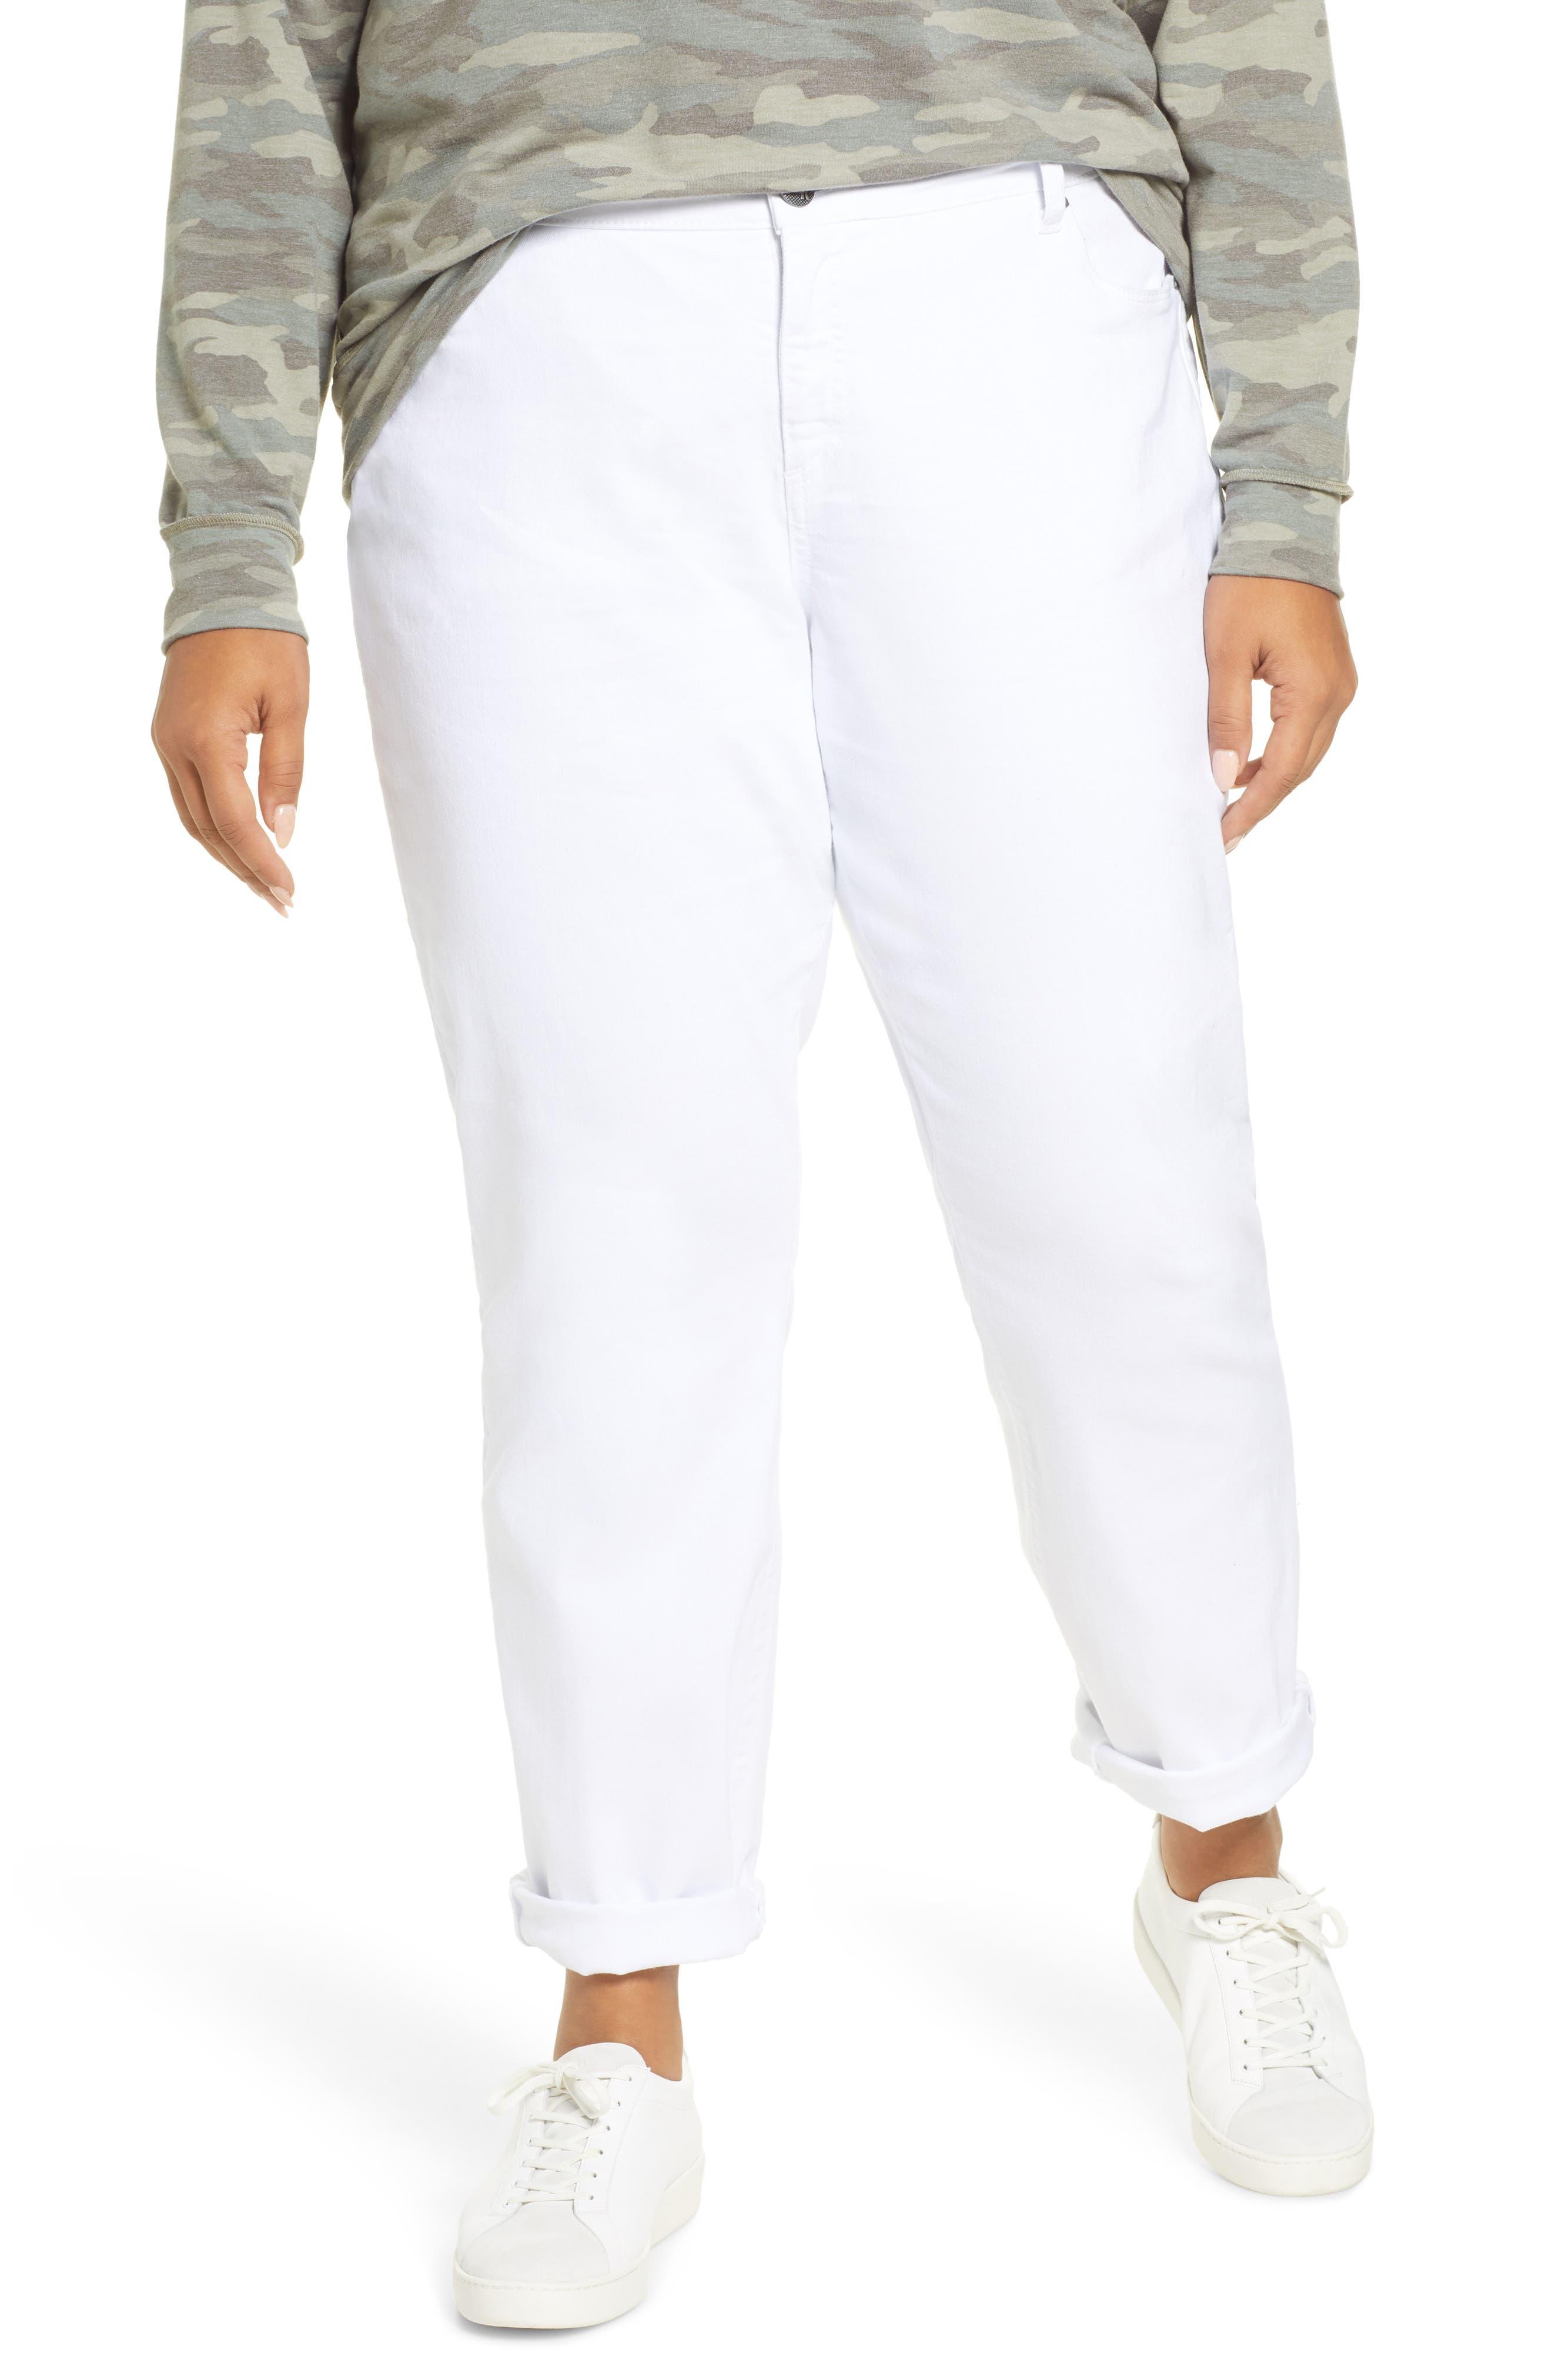 Kut from the Kloth Slouchy Boyfriend Jeans (Plus Size)